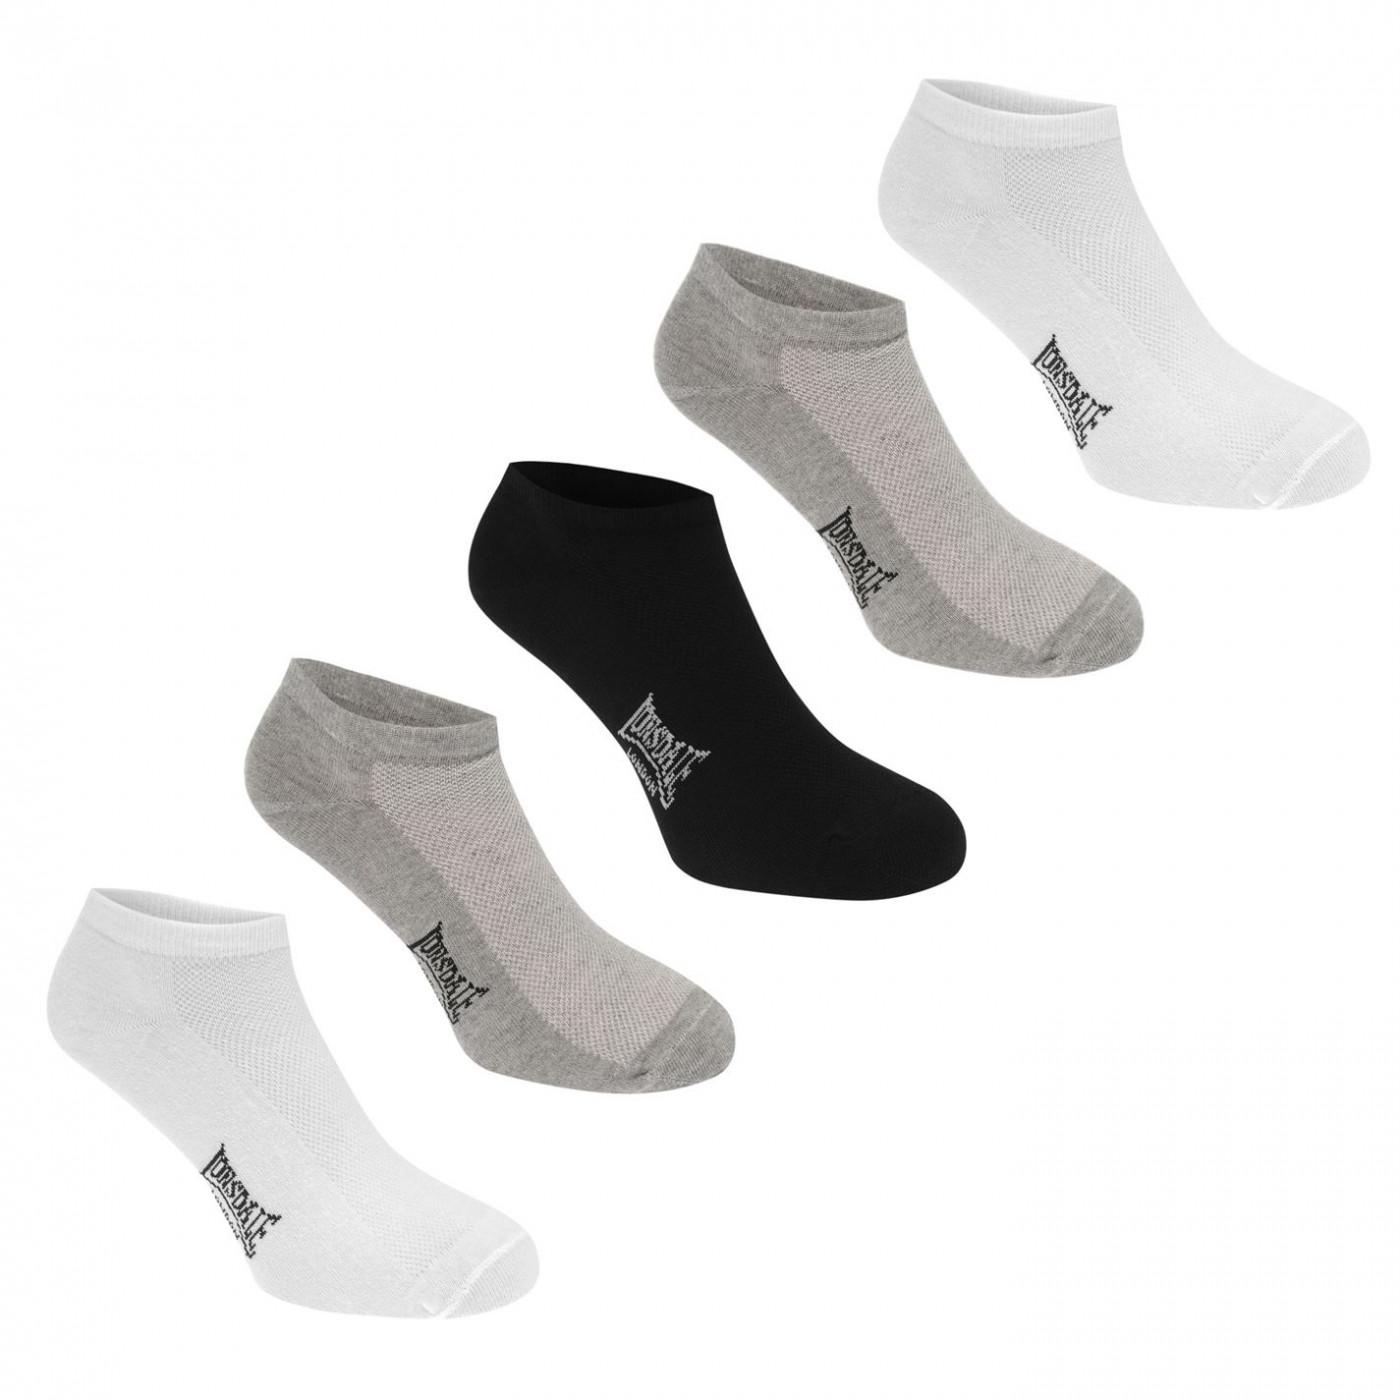 Men's socks Lonsdale 5 Pack